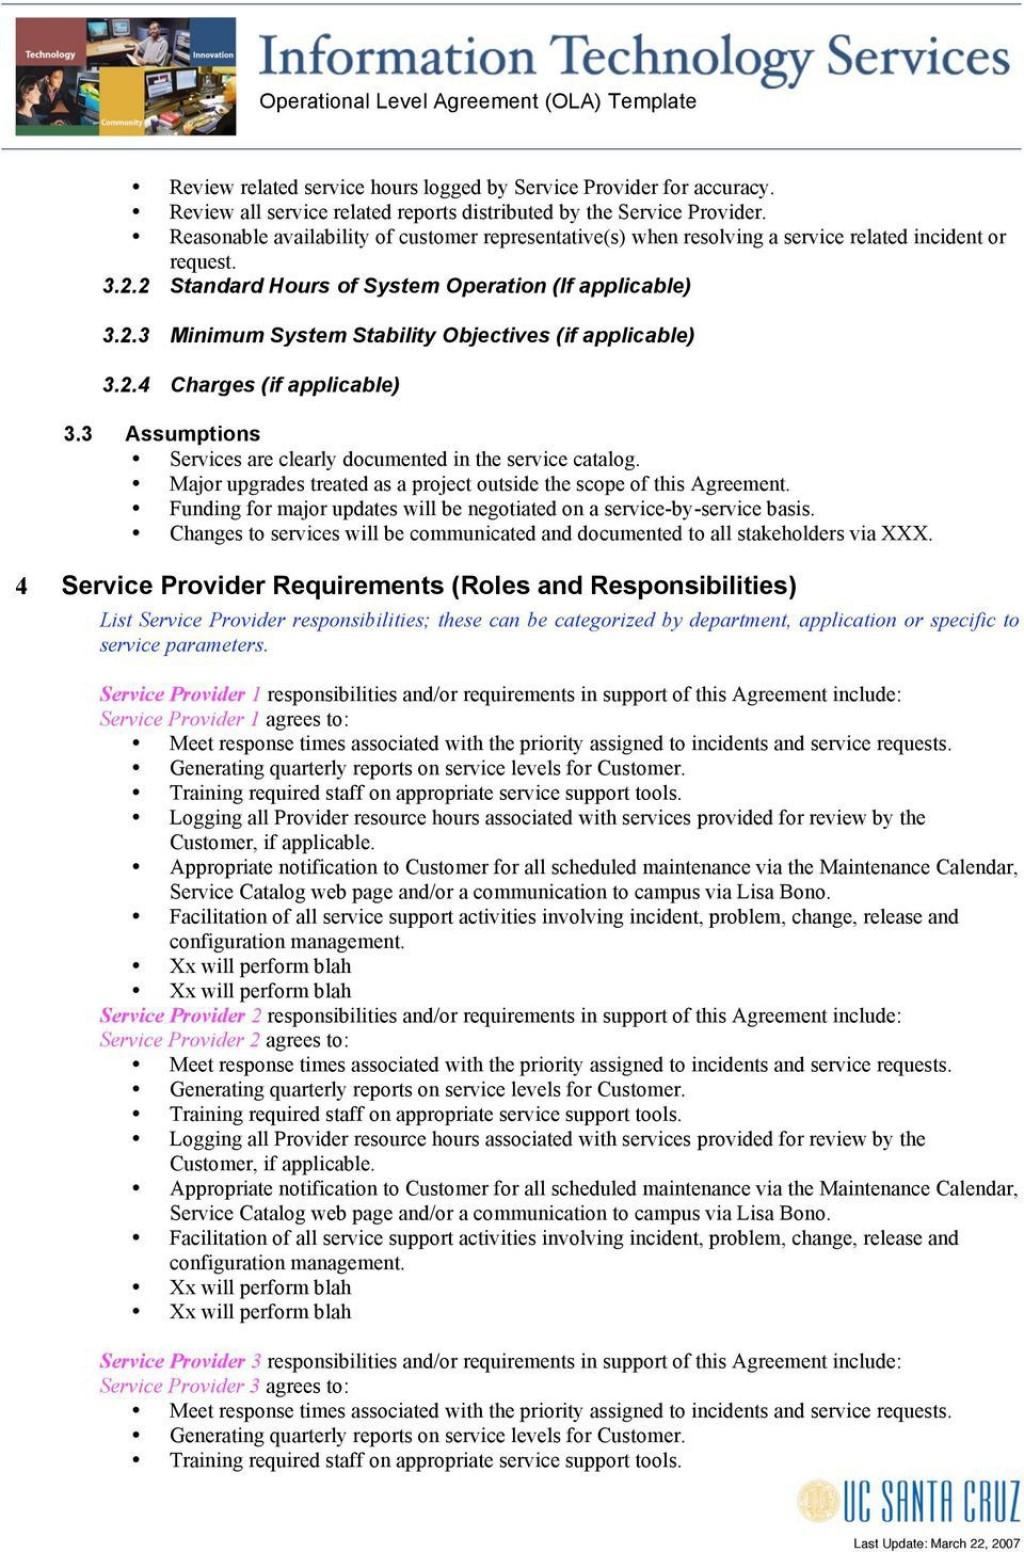 005 Beautiful Service Level Agreement Template High Def  South Africa Nz For Website DevelopmentLarge